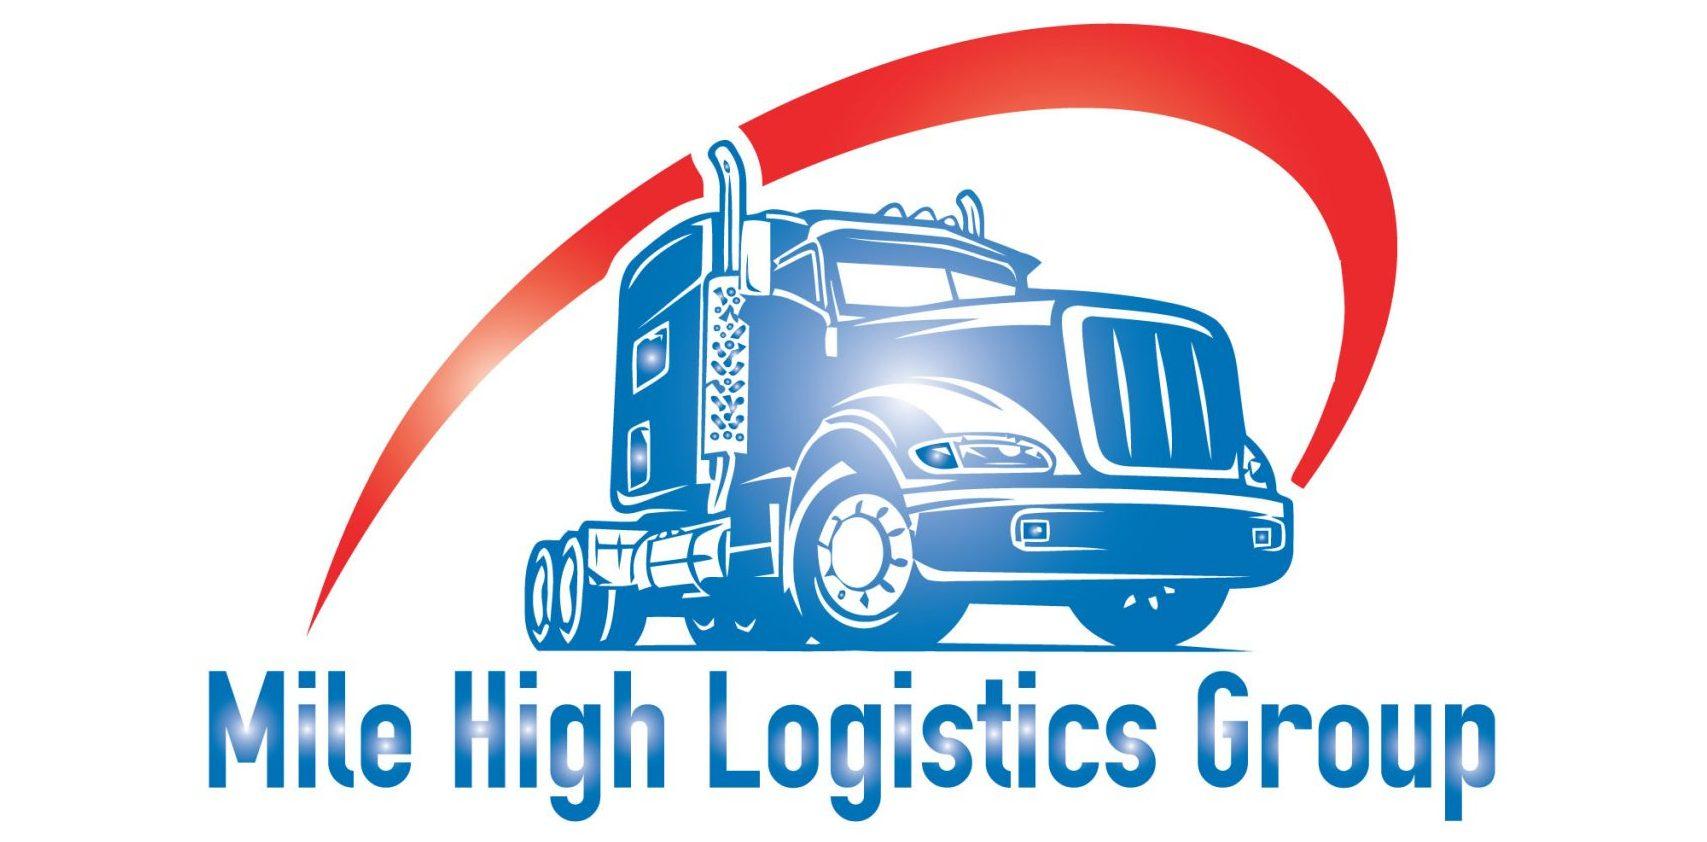 Dispatch and Logistics Services